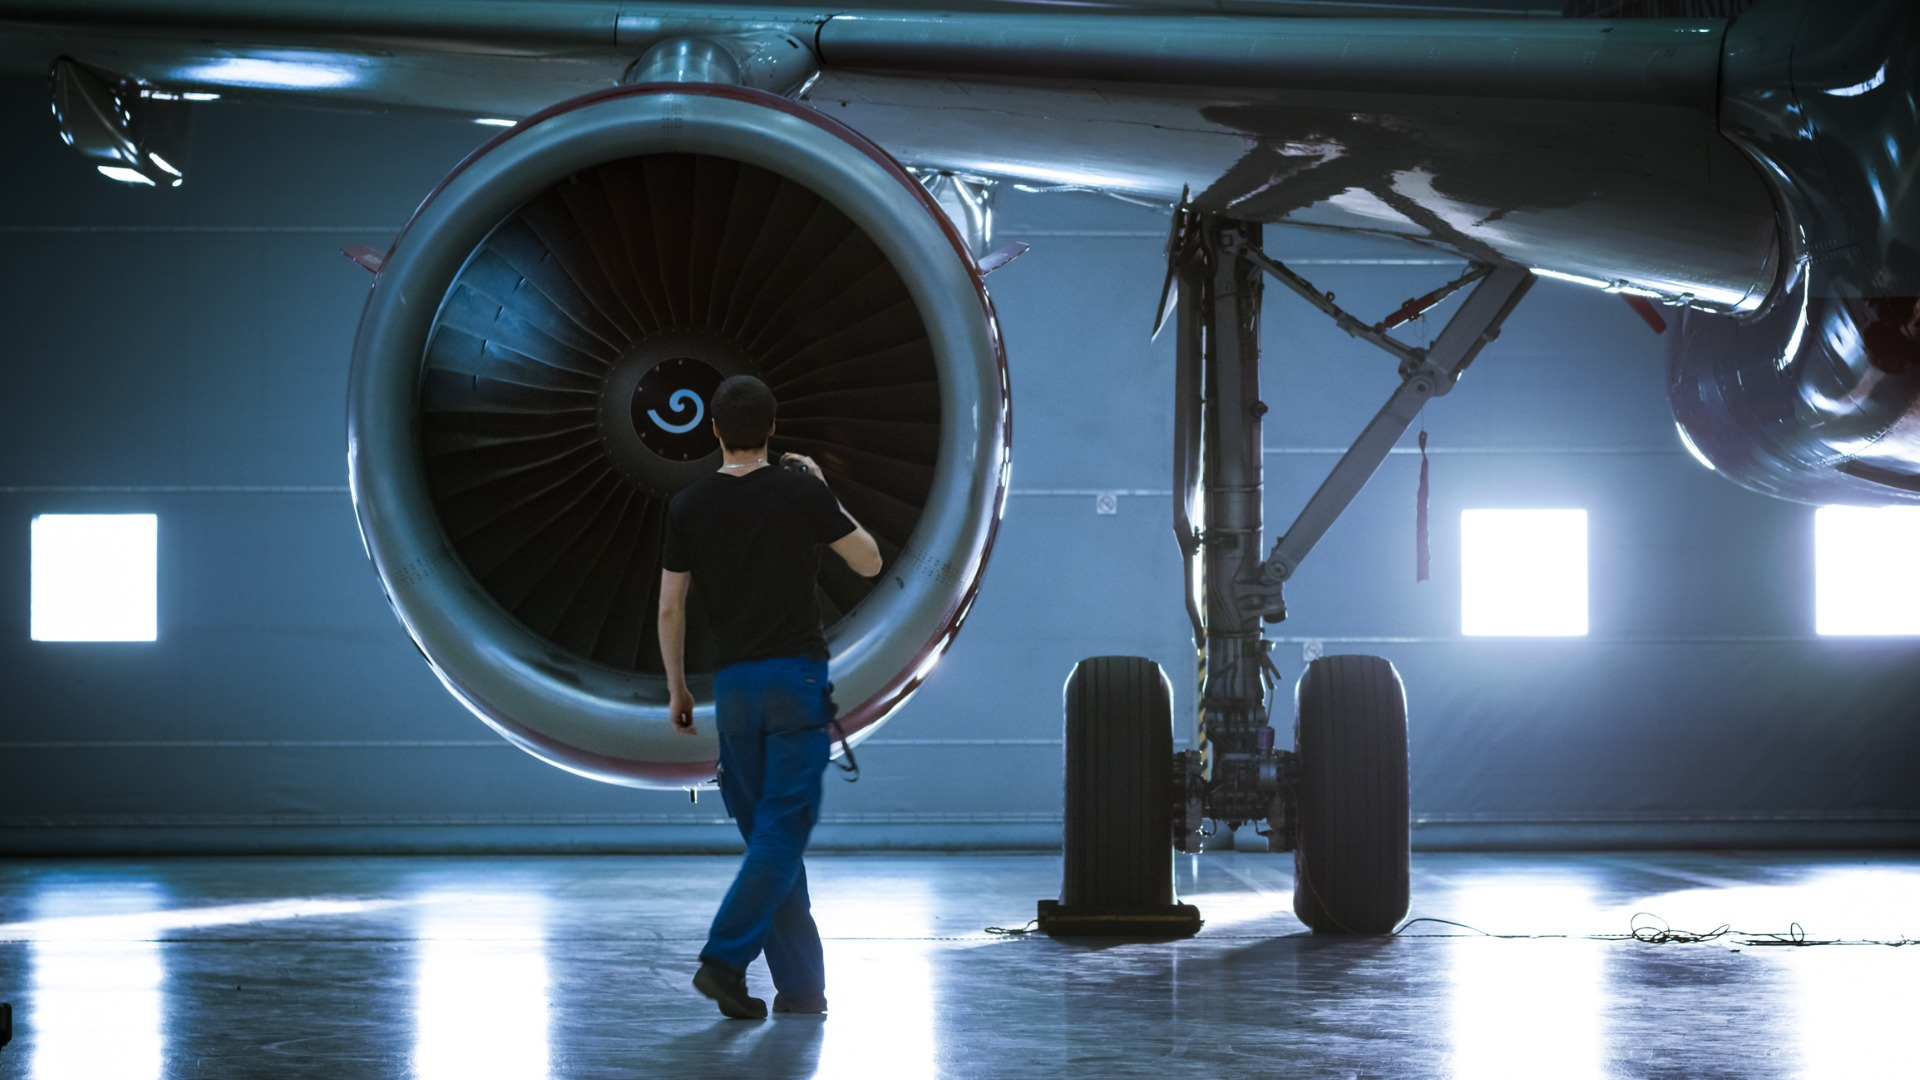 Engines power aviation's greener future